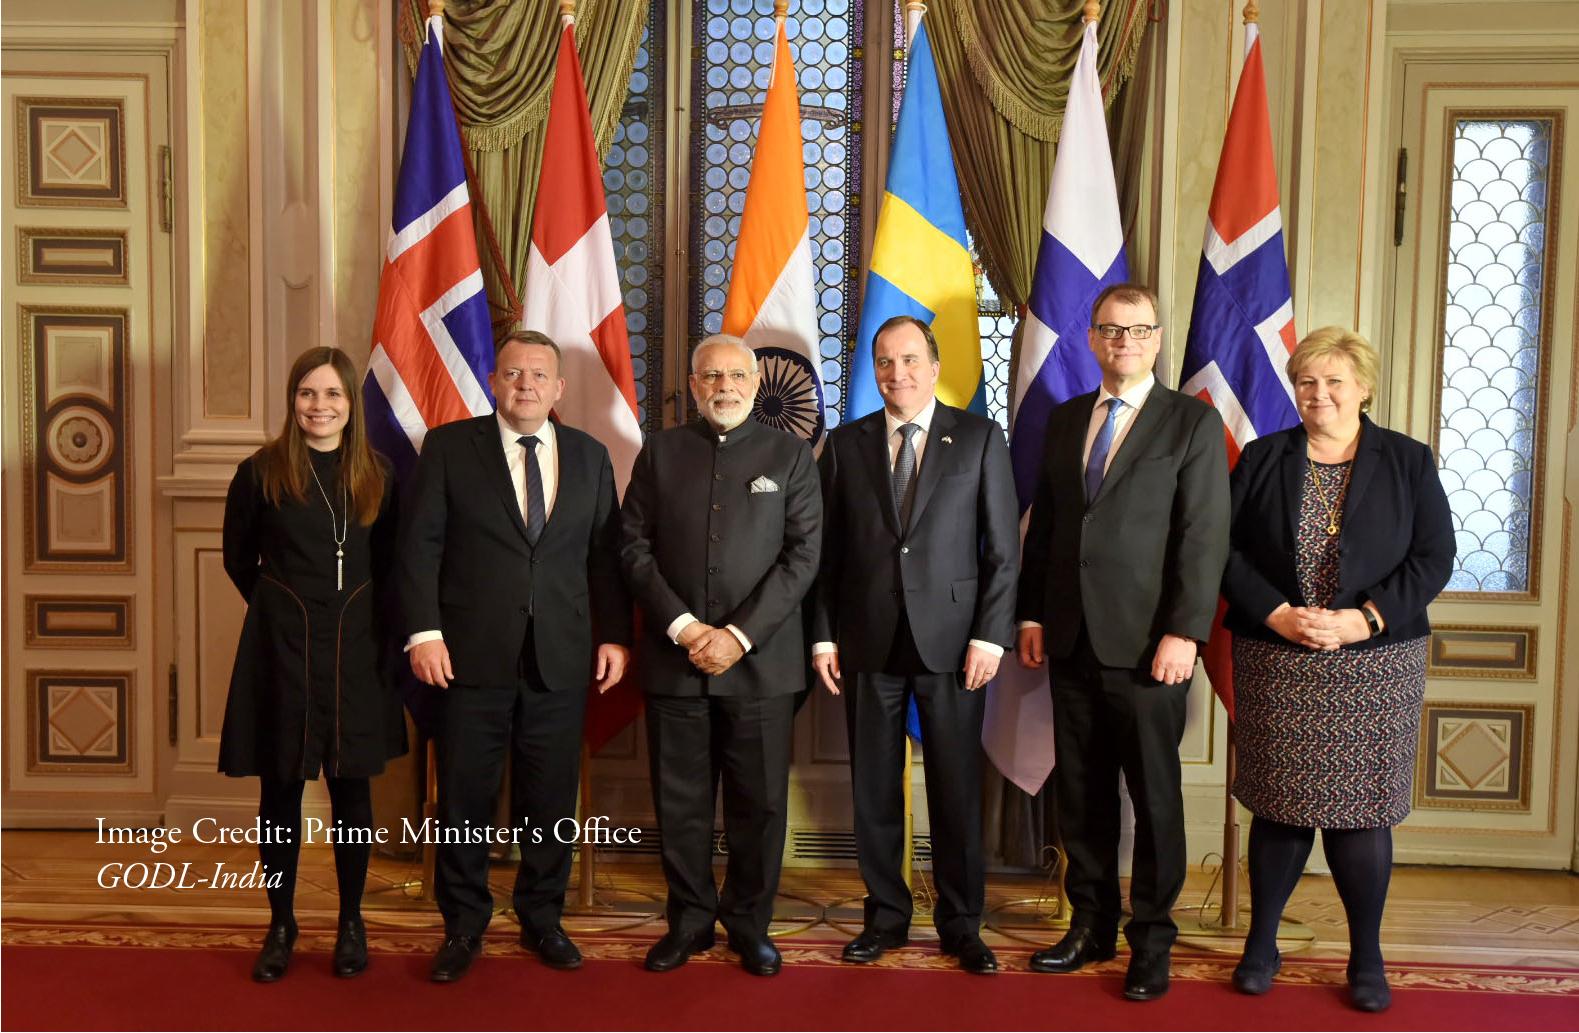 India-Nordic Engagement: A Veritable Strategic Partnership in Reimagine and Configure